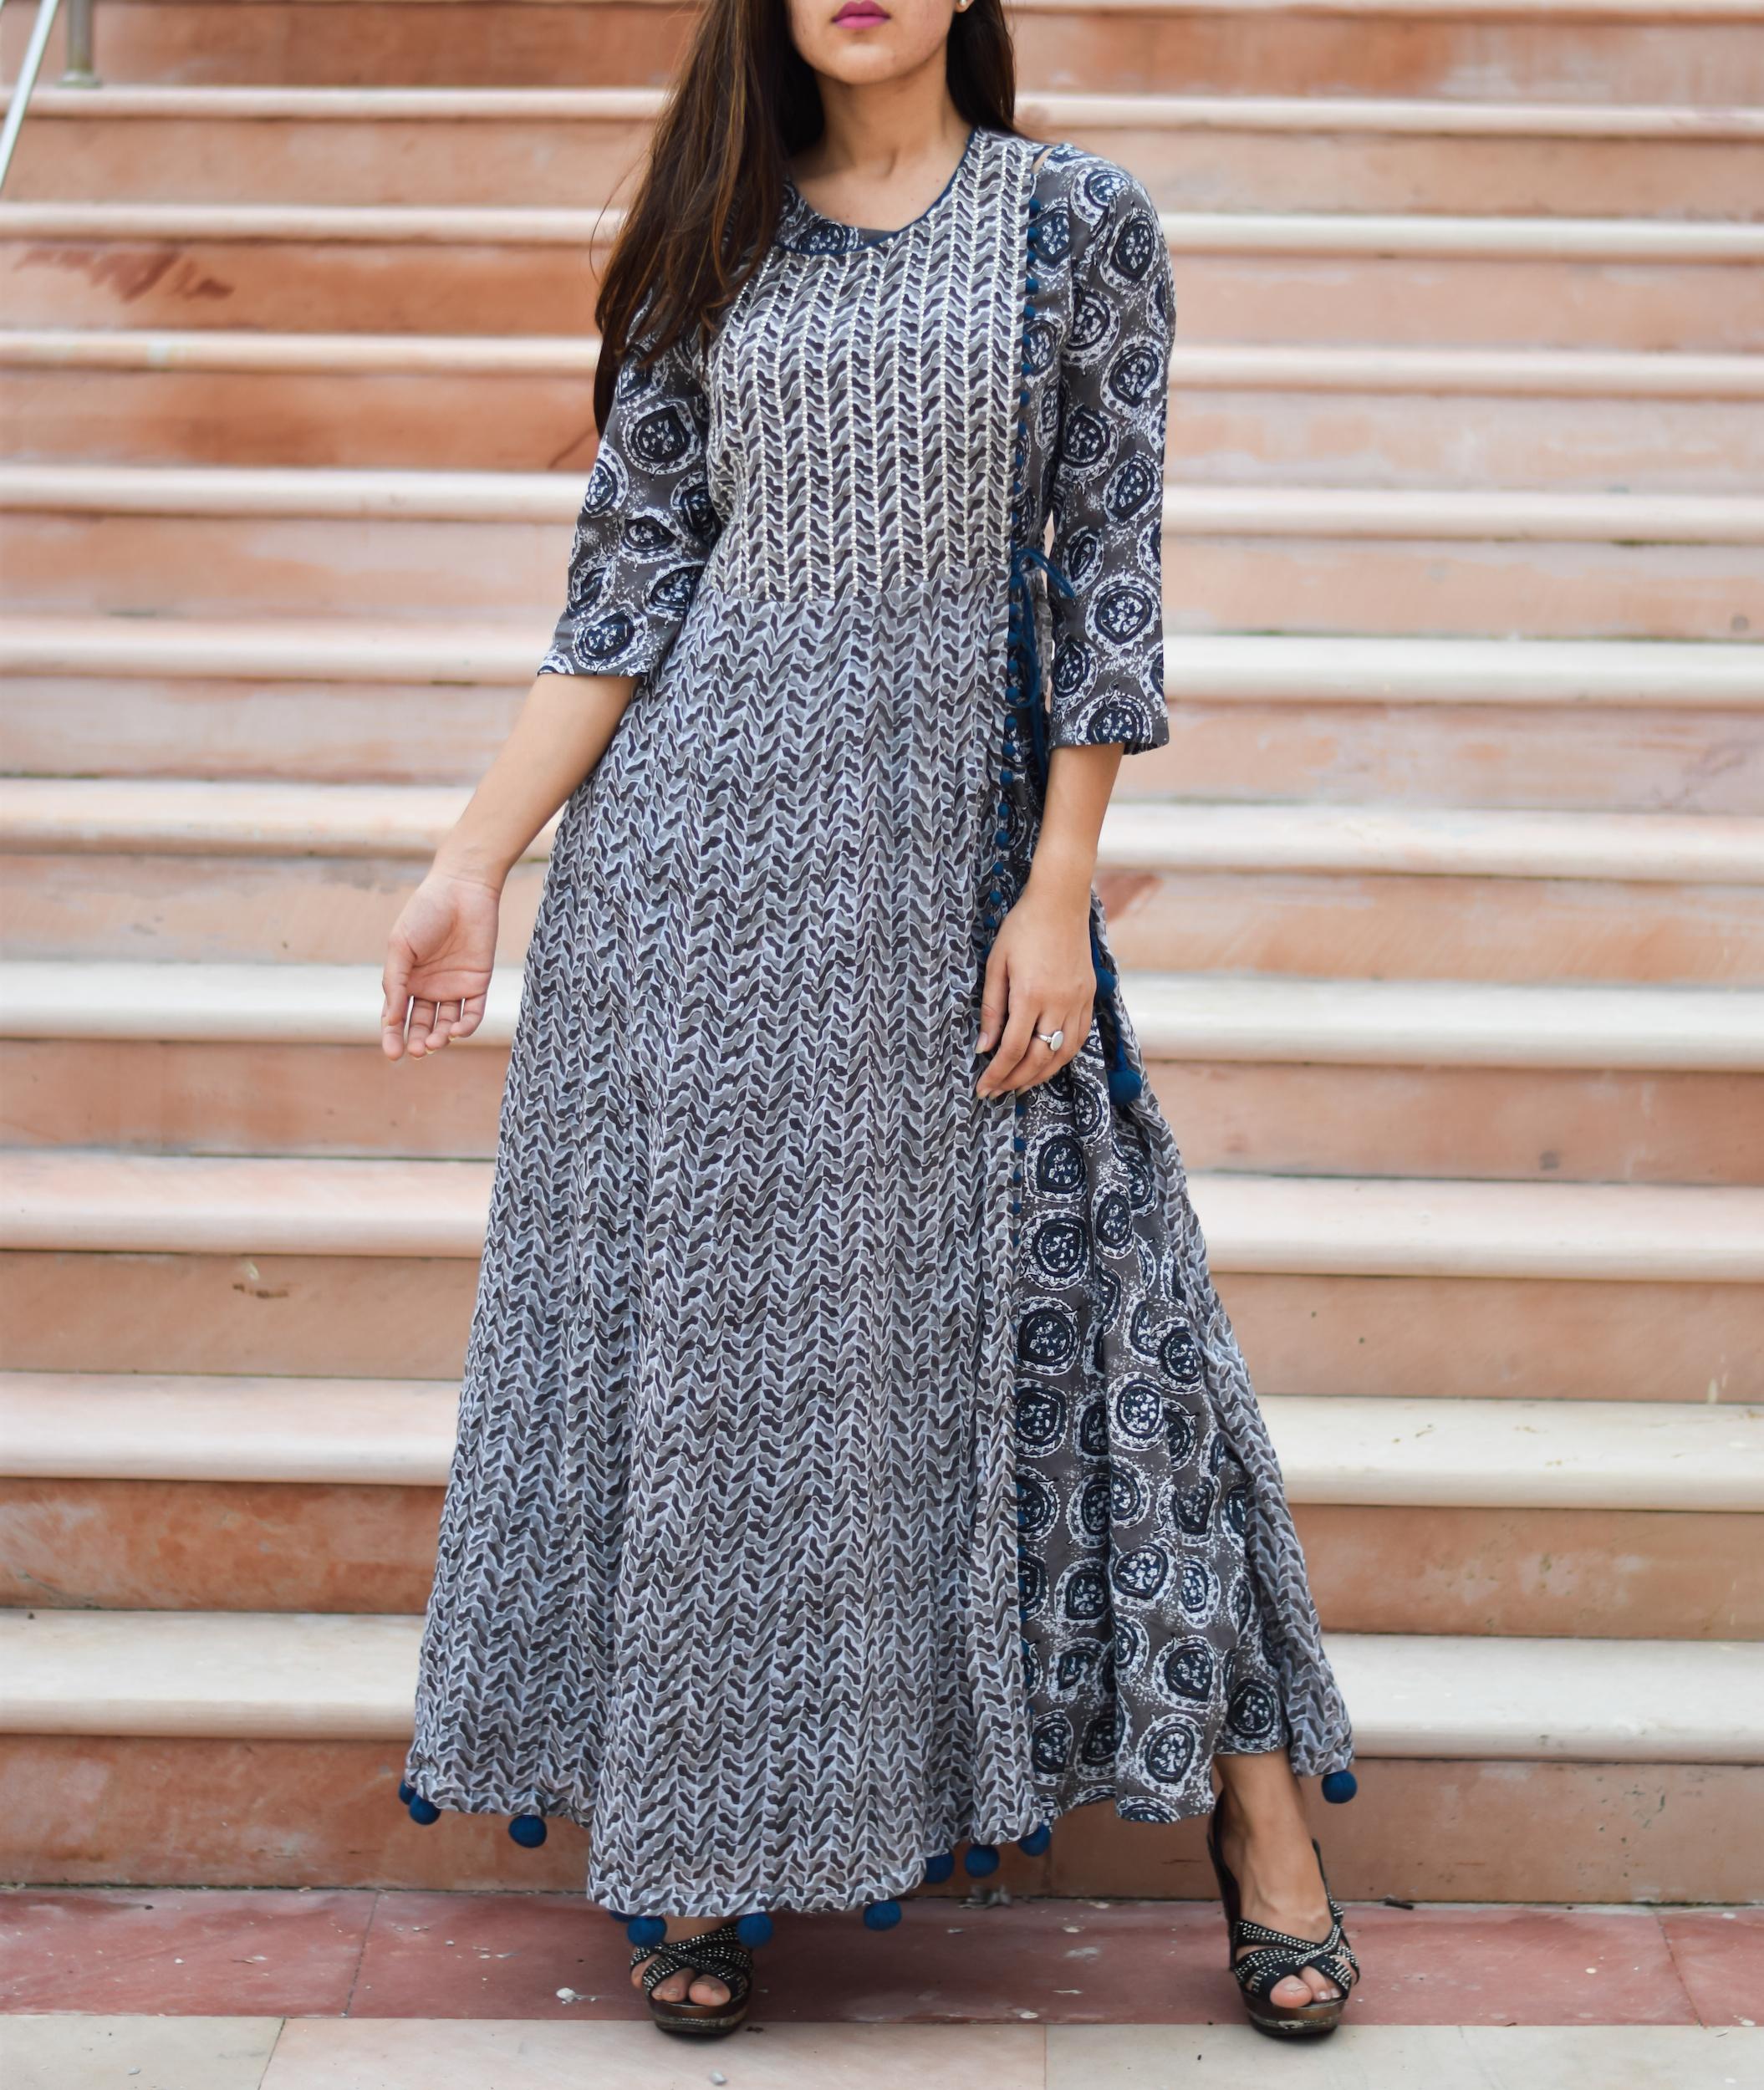 Prussian blue block printed dress